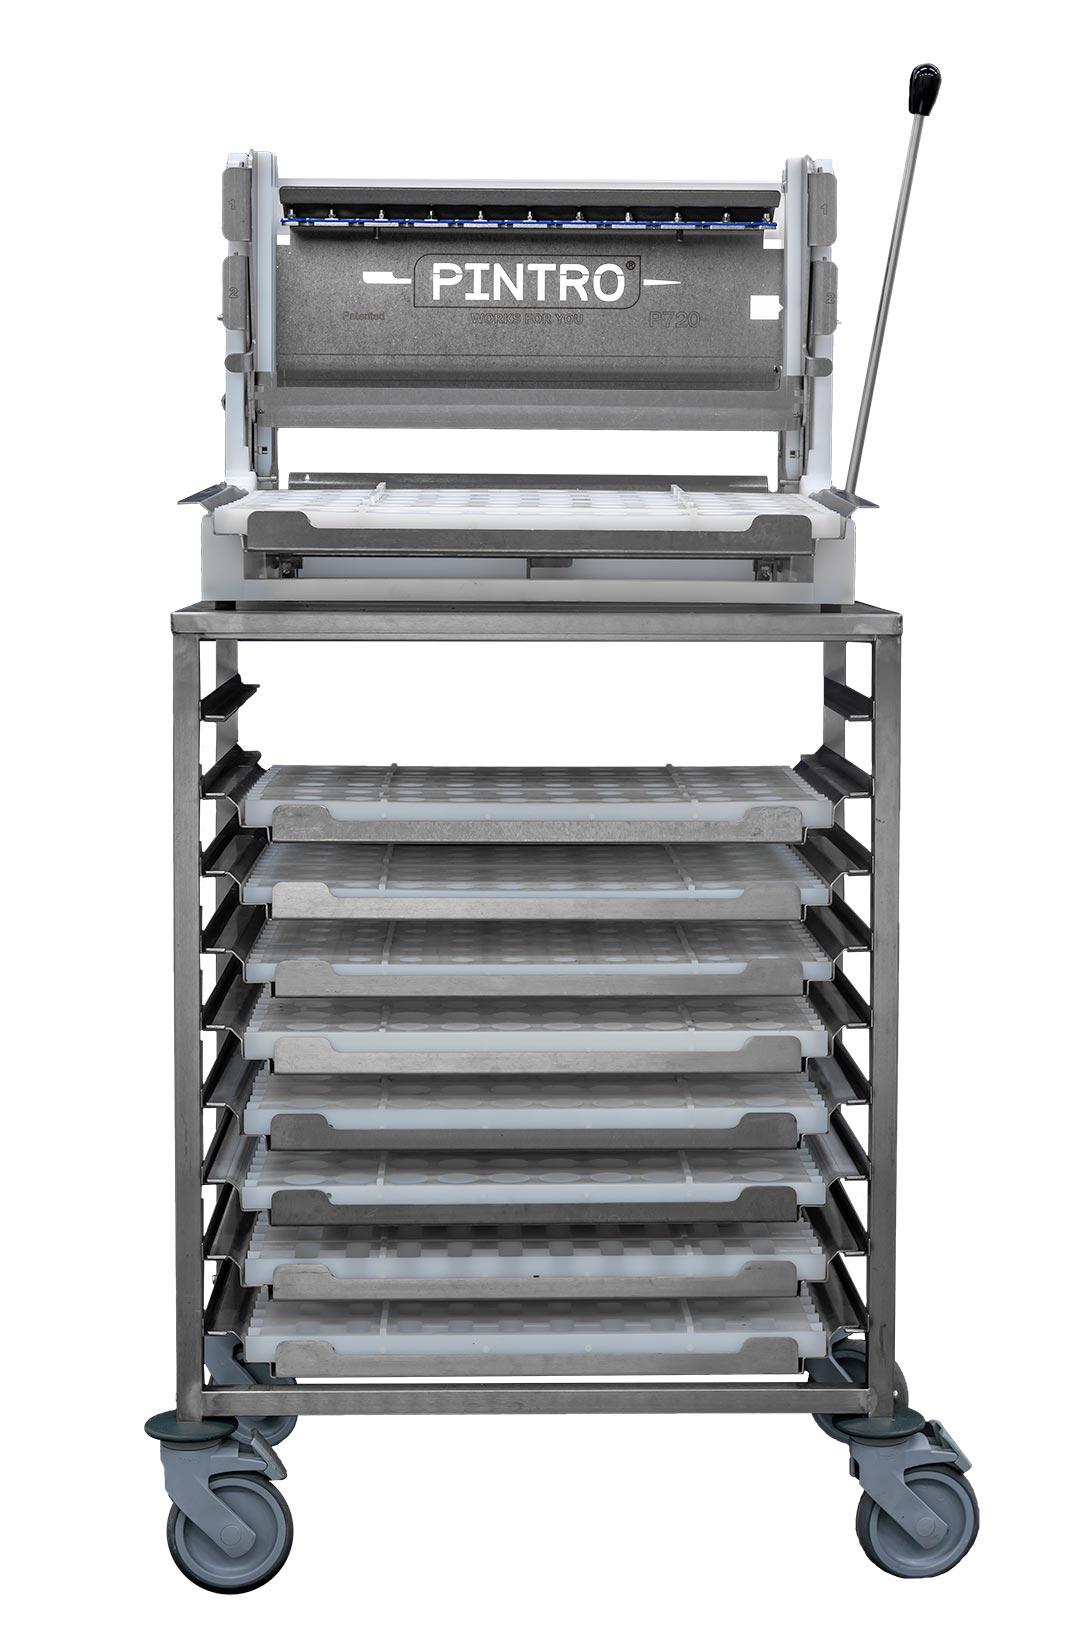 PINTRO P720 manual skewering machine working table and mobile rack